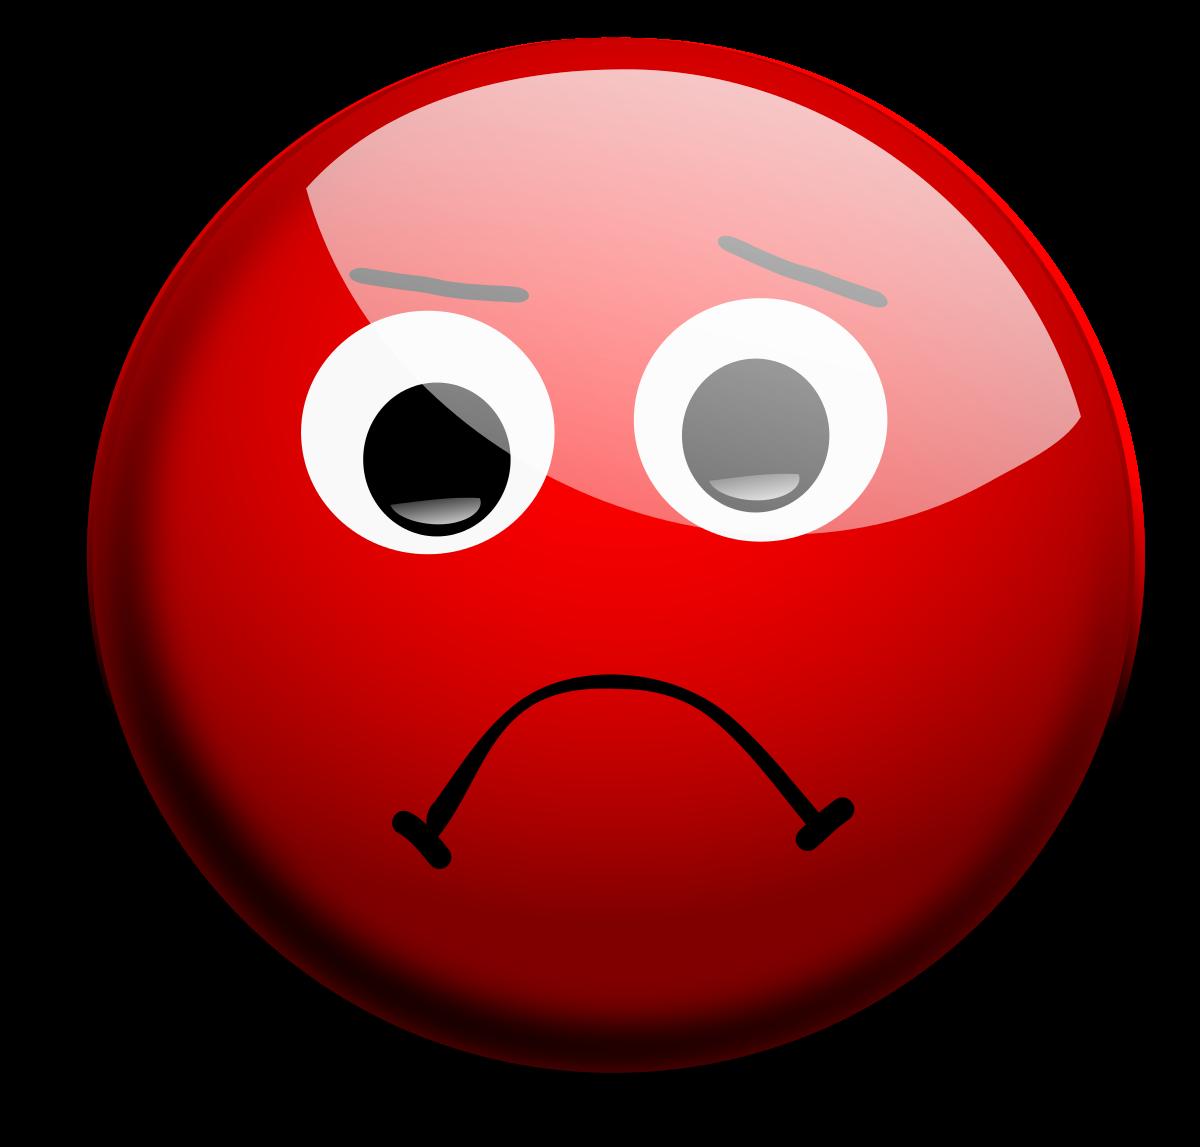 Sad face smiley face clip art images image 2